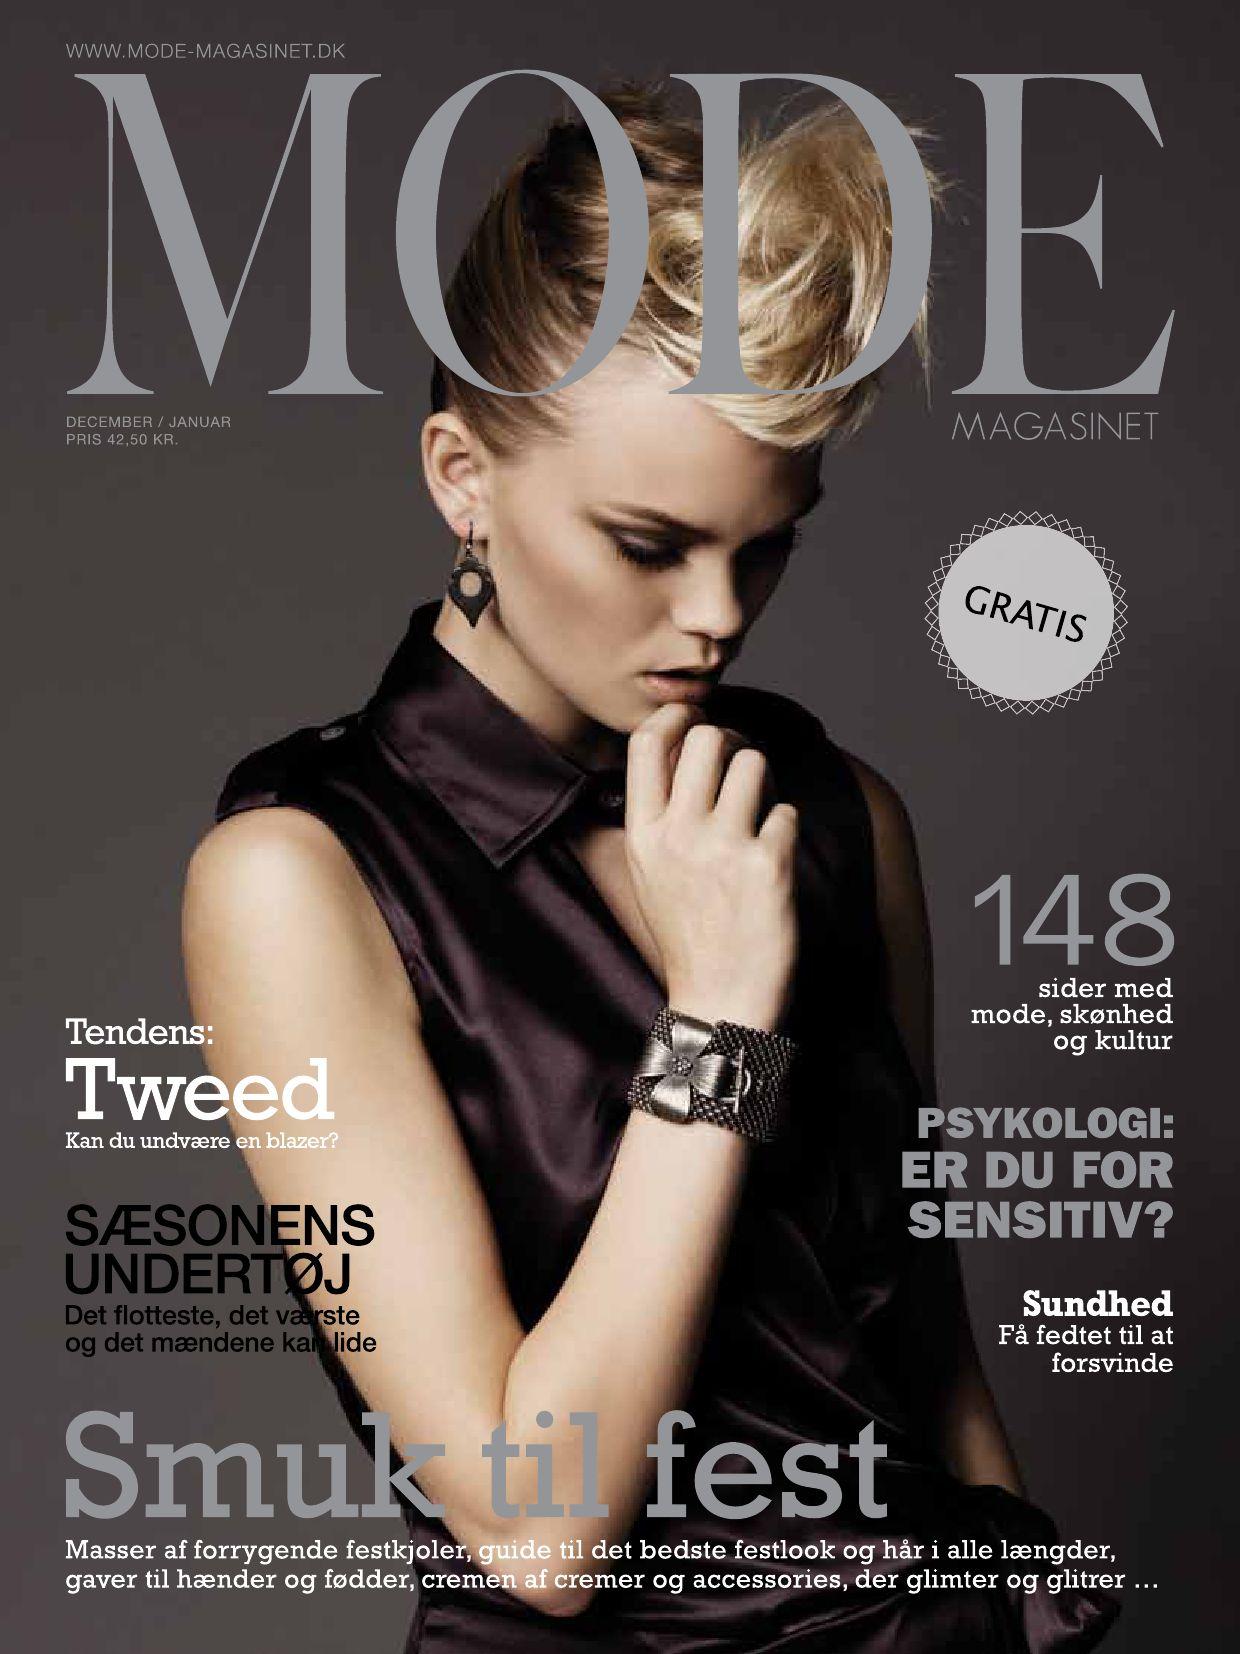 646487f7 ModeMagasinet #03 by Mathilde Holkenfeldt Behrendt - issuu